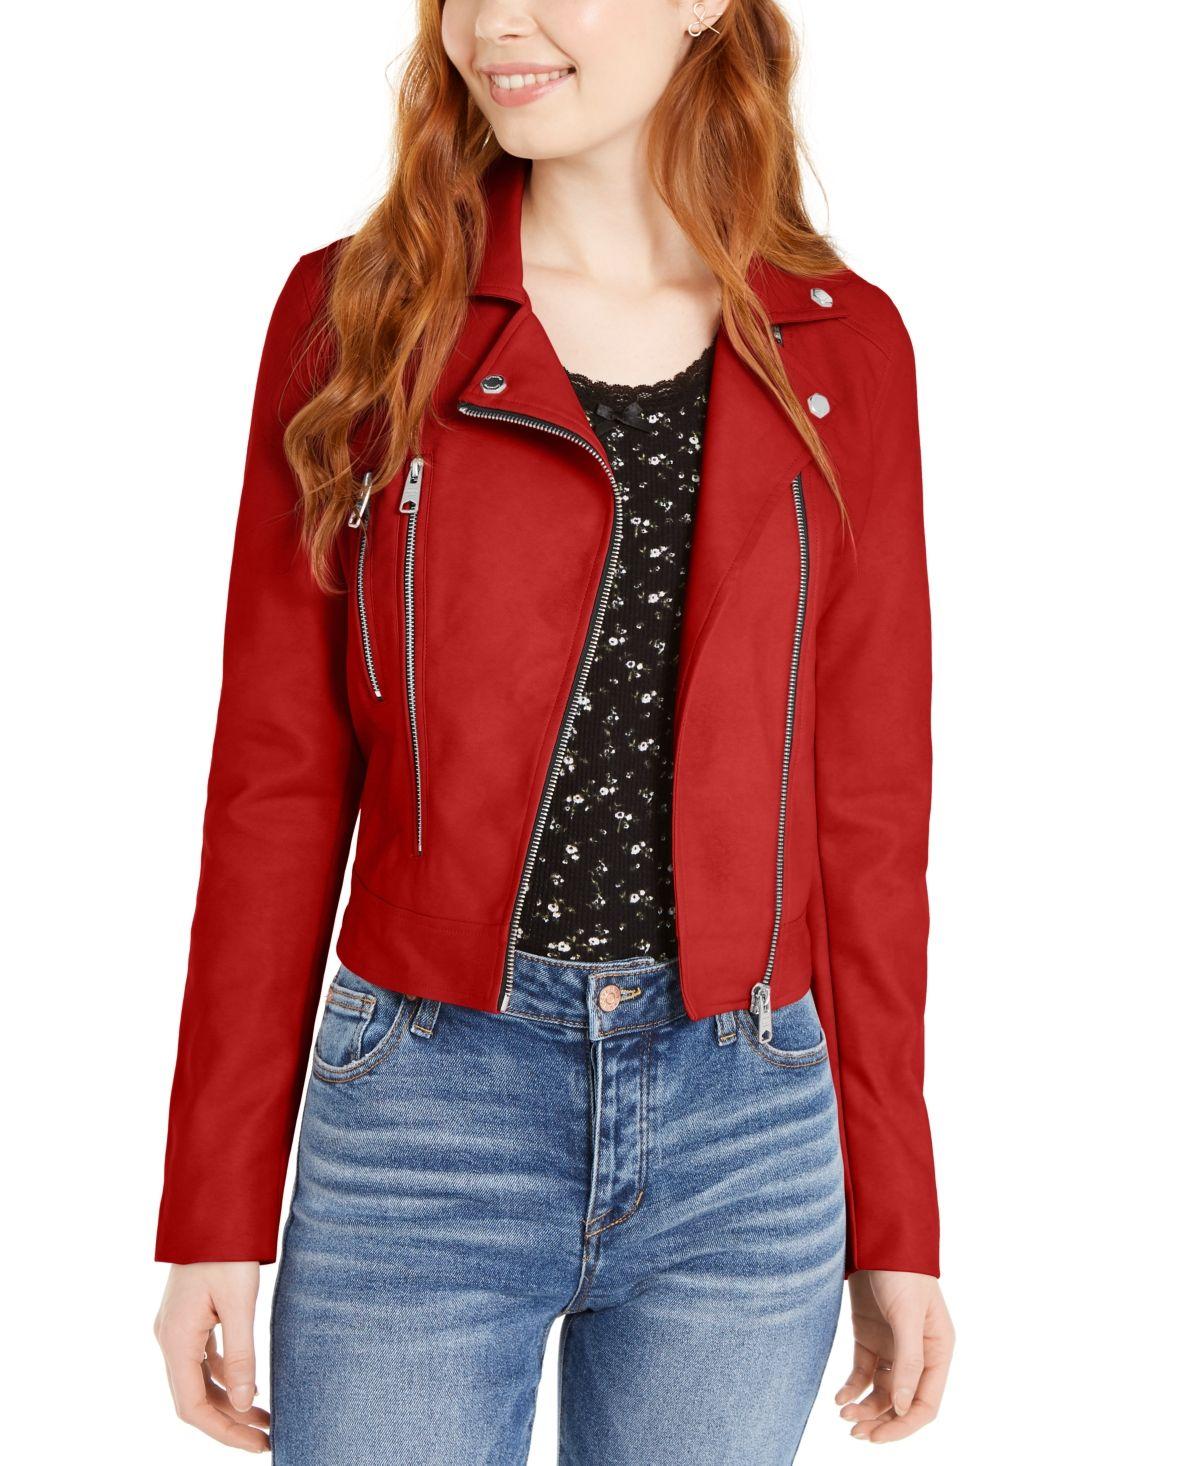 Coffeeshop Juniors Faux Leather Jacket Red Love Red Leather Jacket Outfit Leather Jacket Leather Jackets Women [ 1466 x 1200 Pixel ]